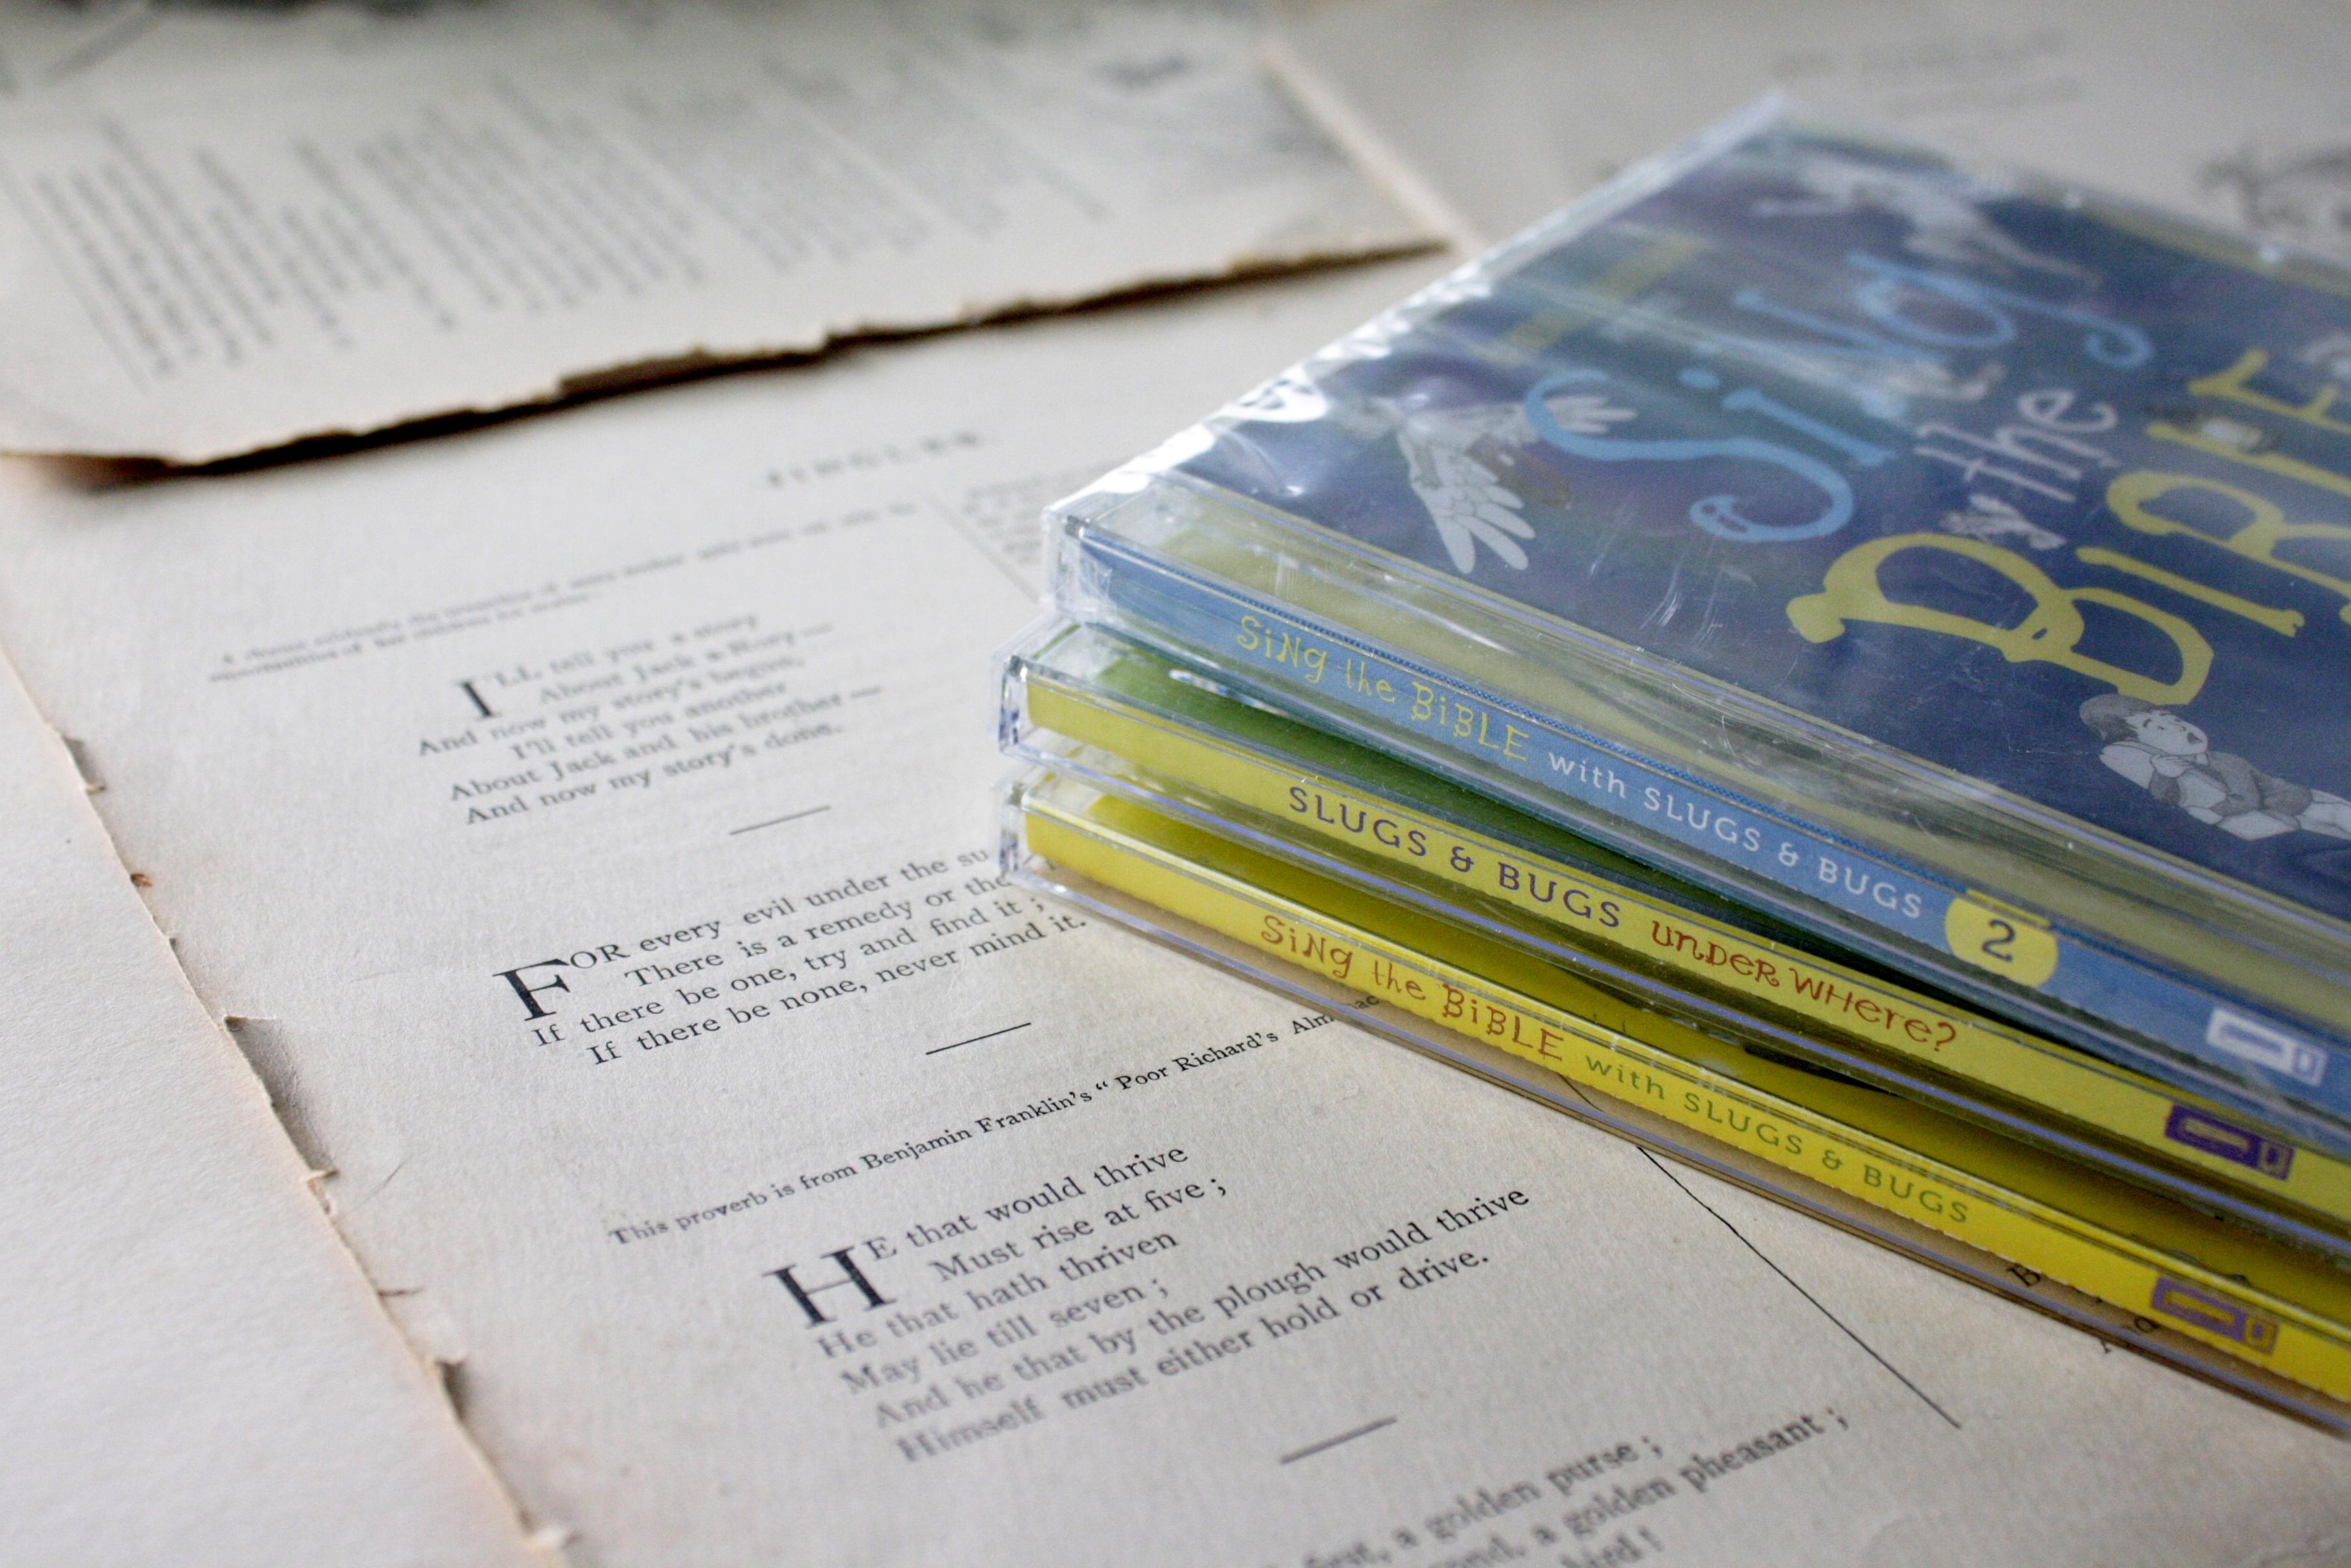 Slugs & Bugs, Sing the Bible | A Kickstarter Campaign